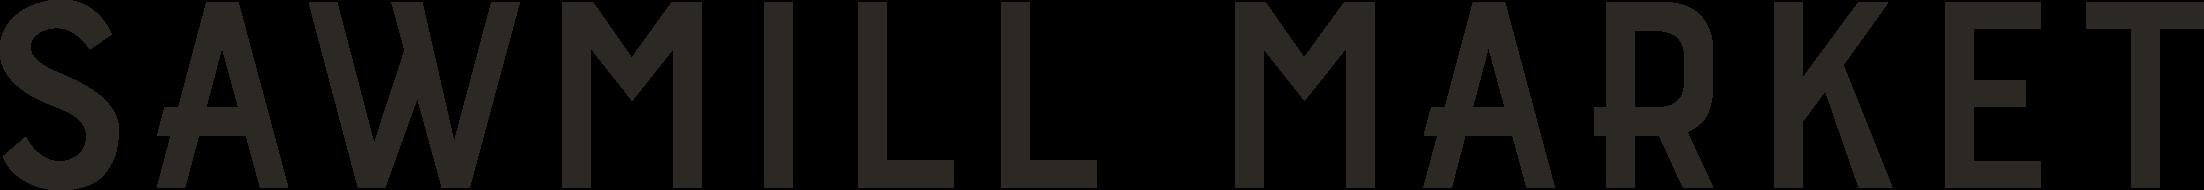 Sawmill Market logo